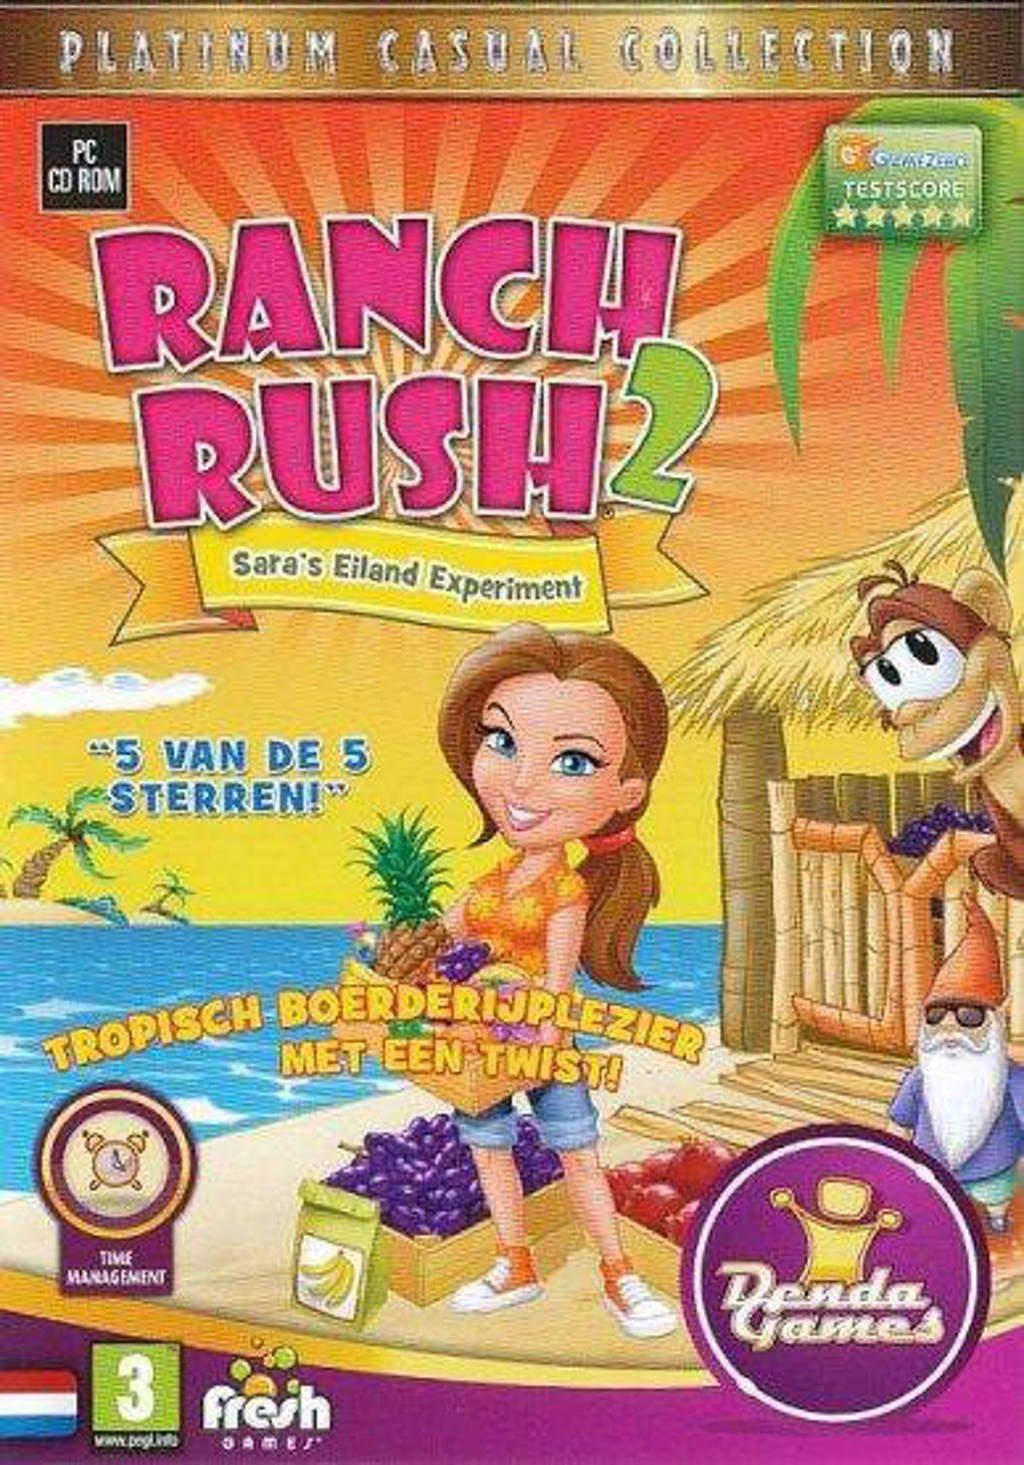 Ranch rush 2 (PC)